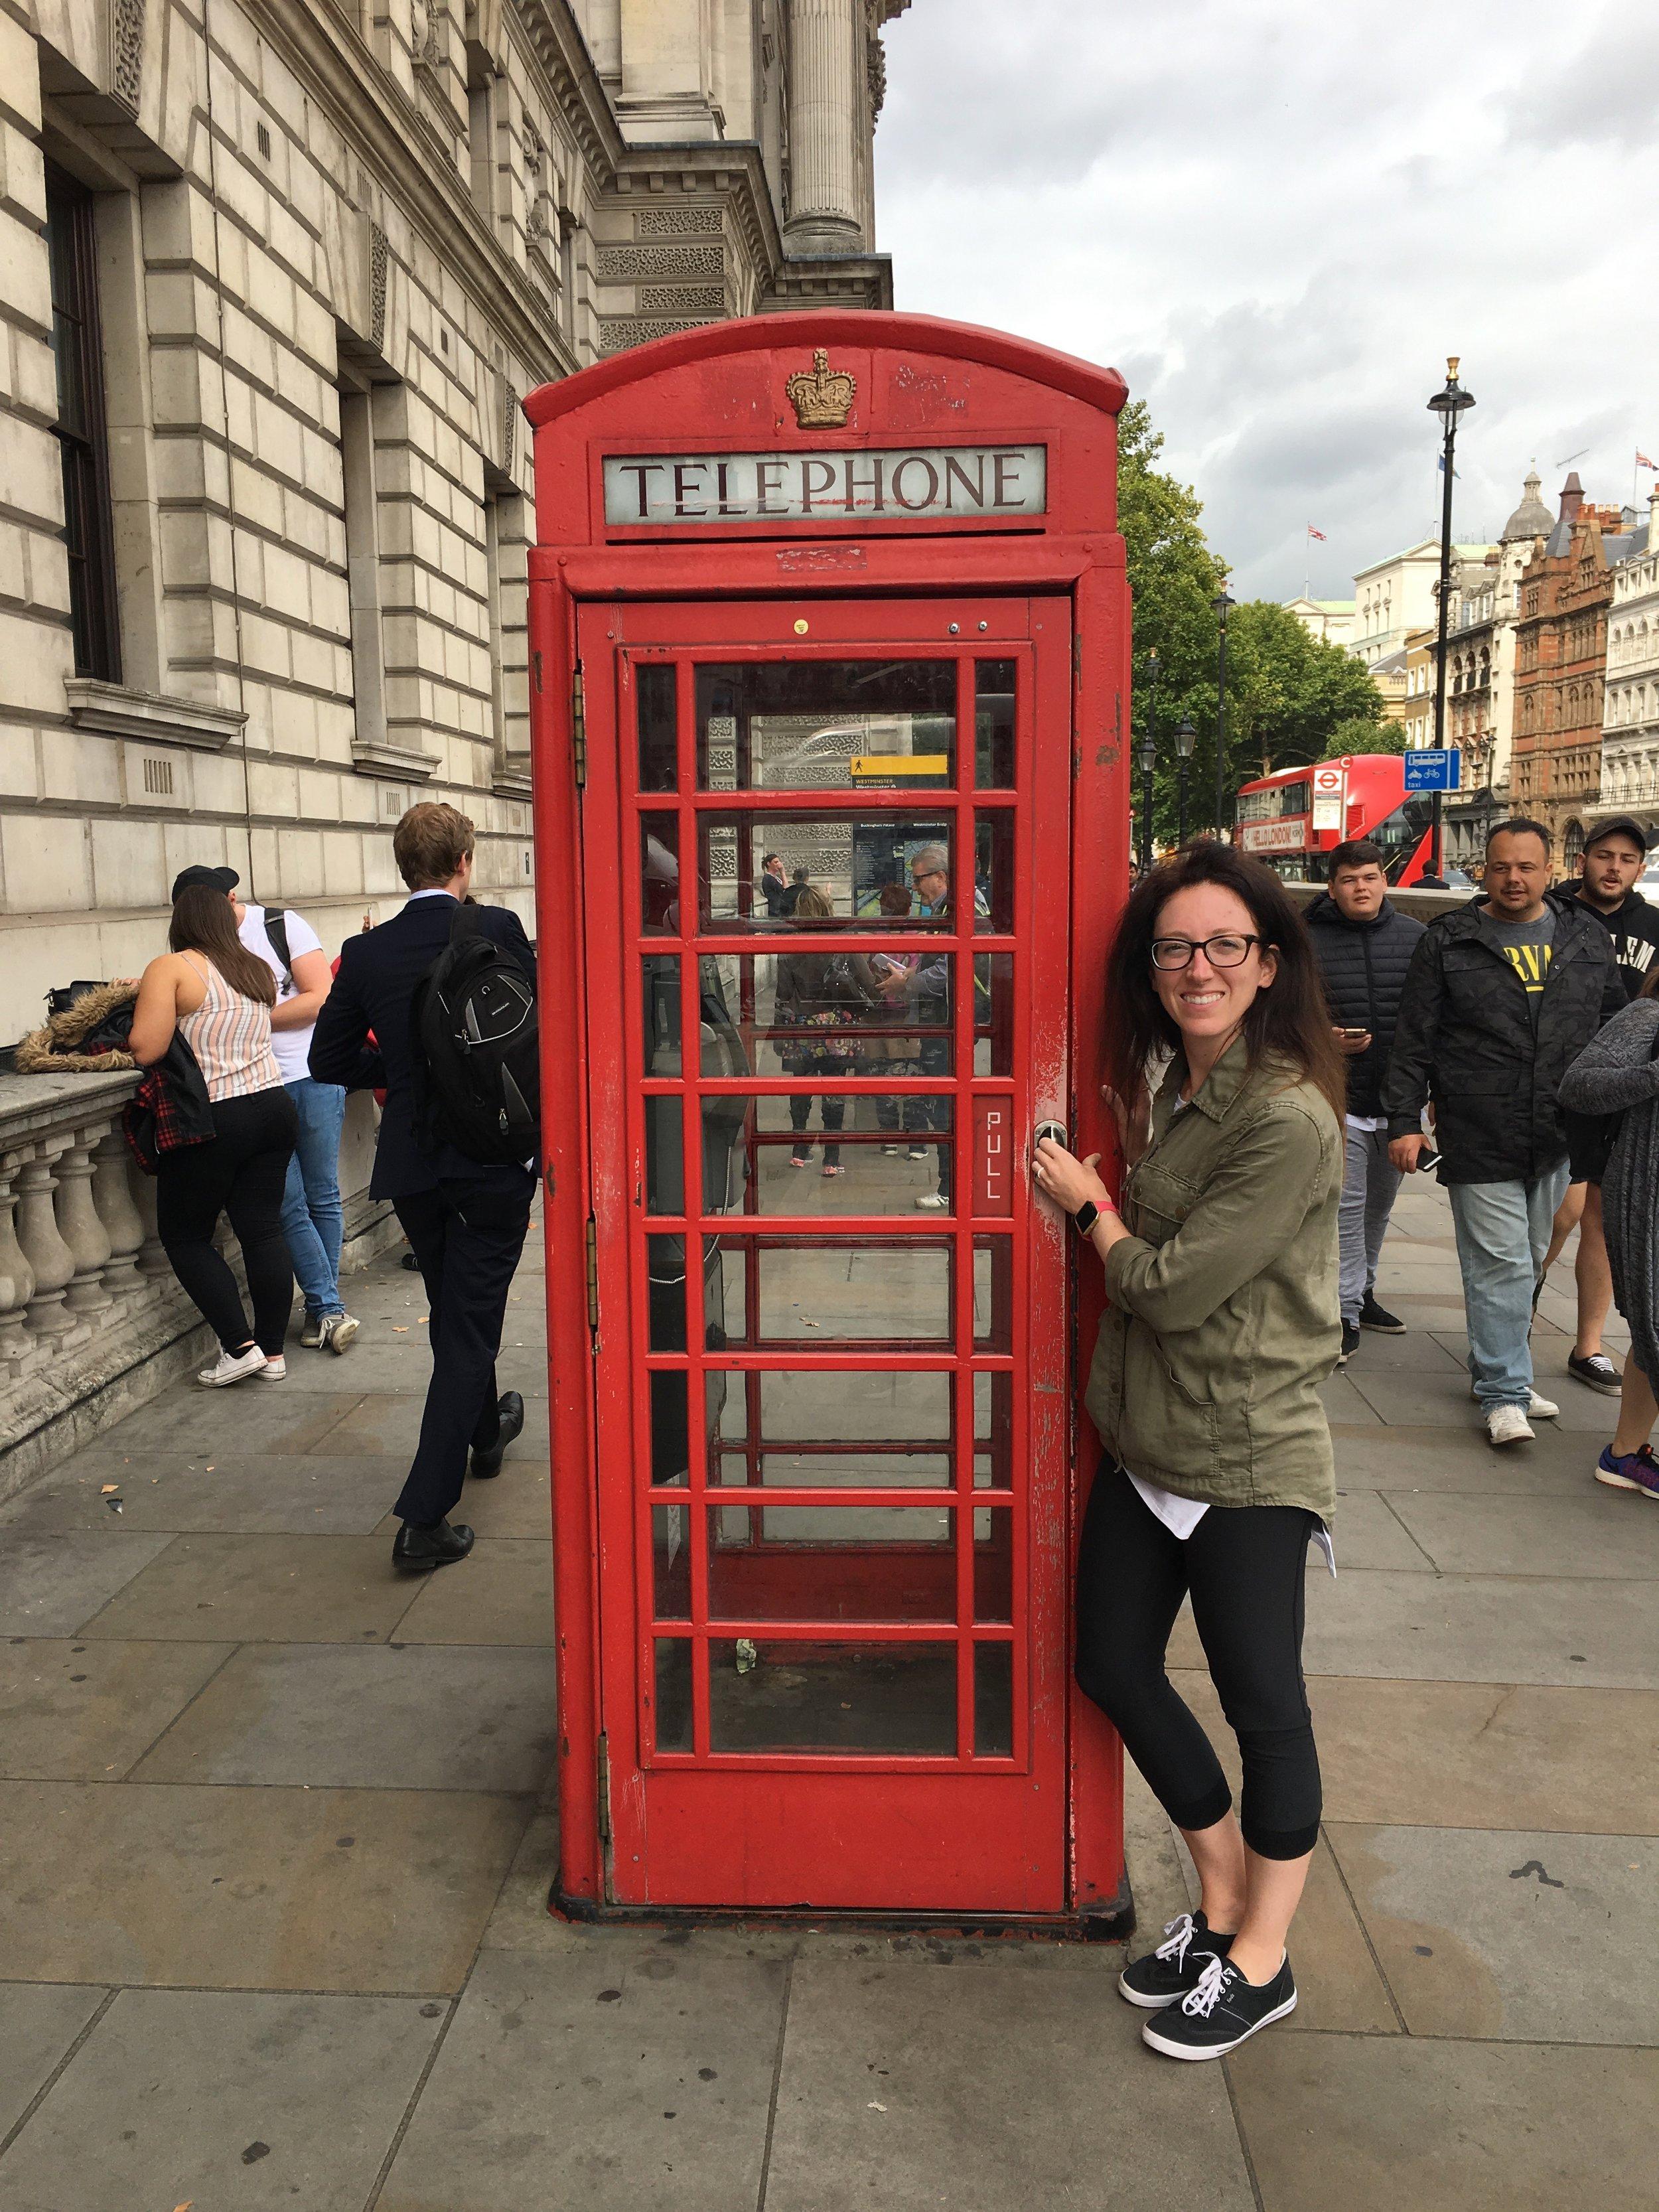 Telephone Booths that line the street near Big Ben